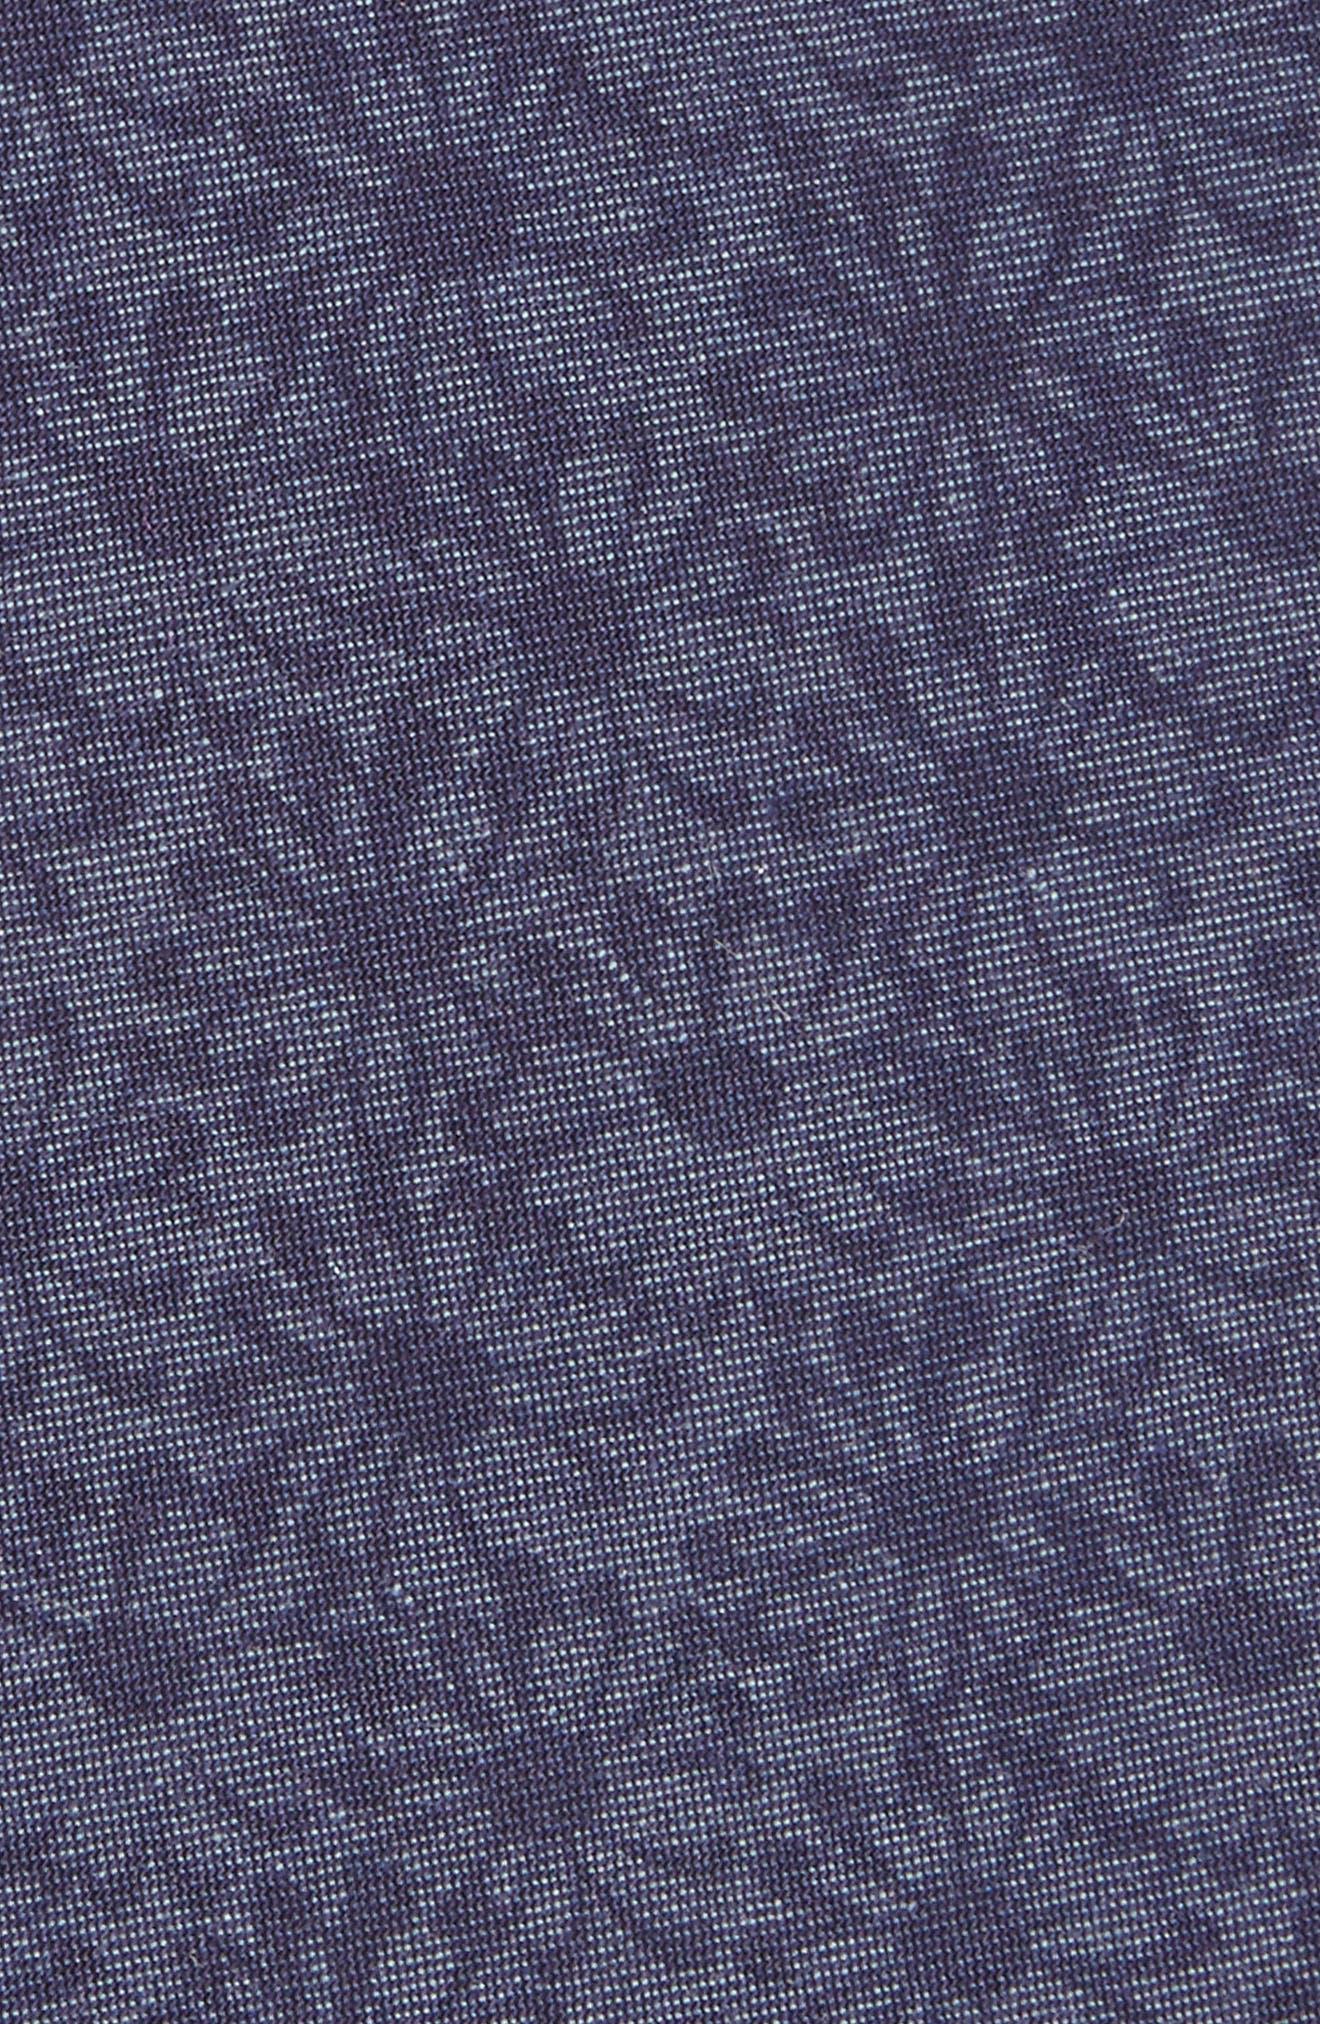 Floral Cotton Tie,                             Alternate thumbnail 2, color,                             Navy/ Daisy